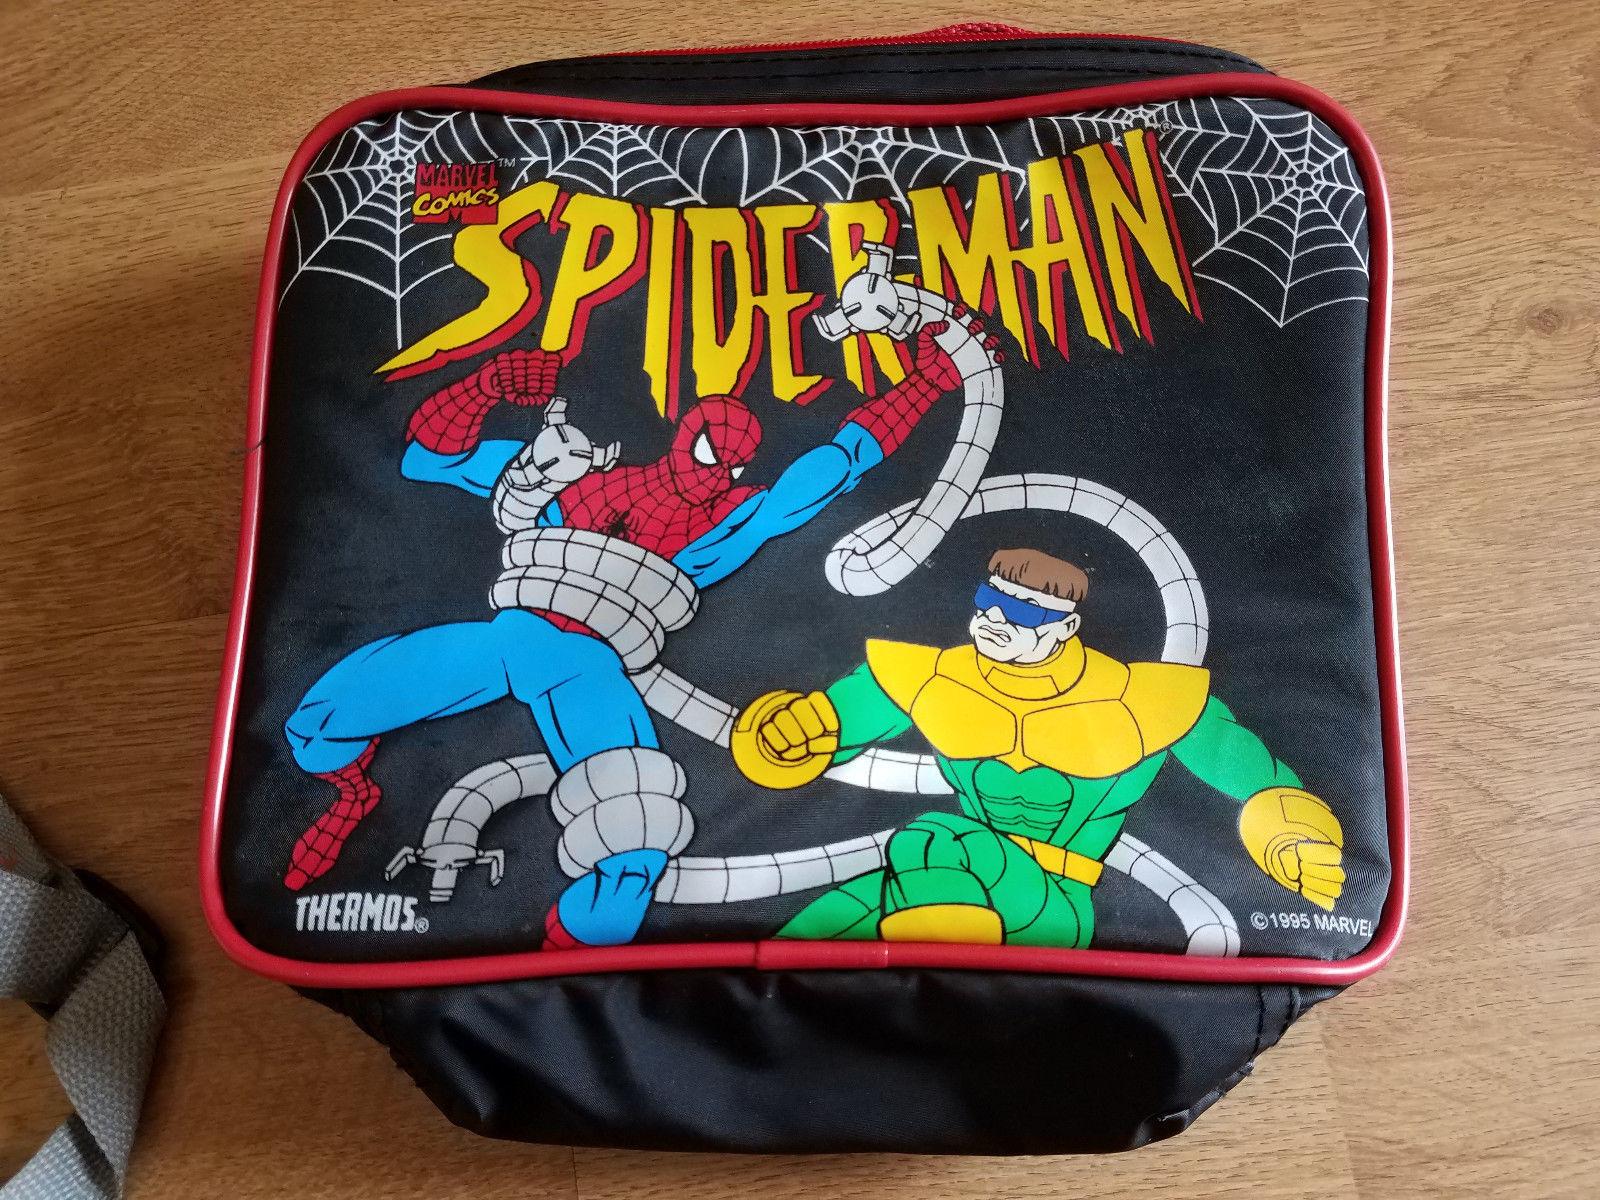 "1995 Marvel Spider-Man Vinyl Lunch Box Doc Oc 10x7"" - $11.99"